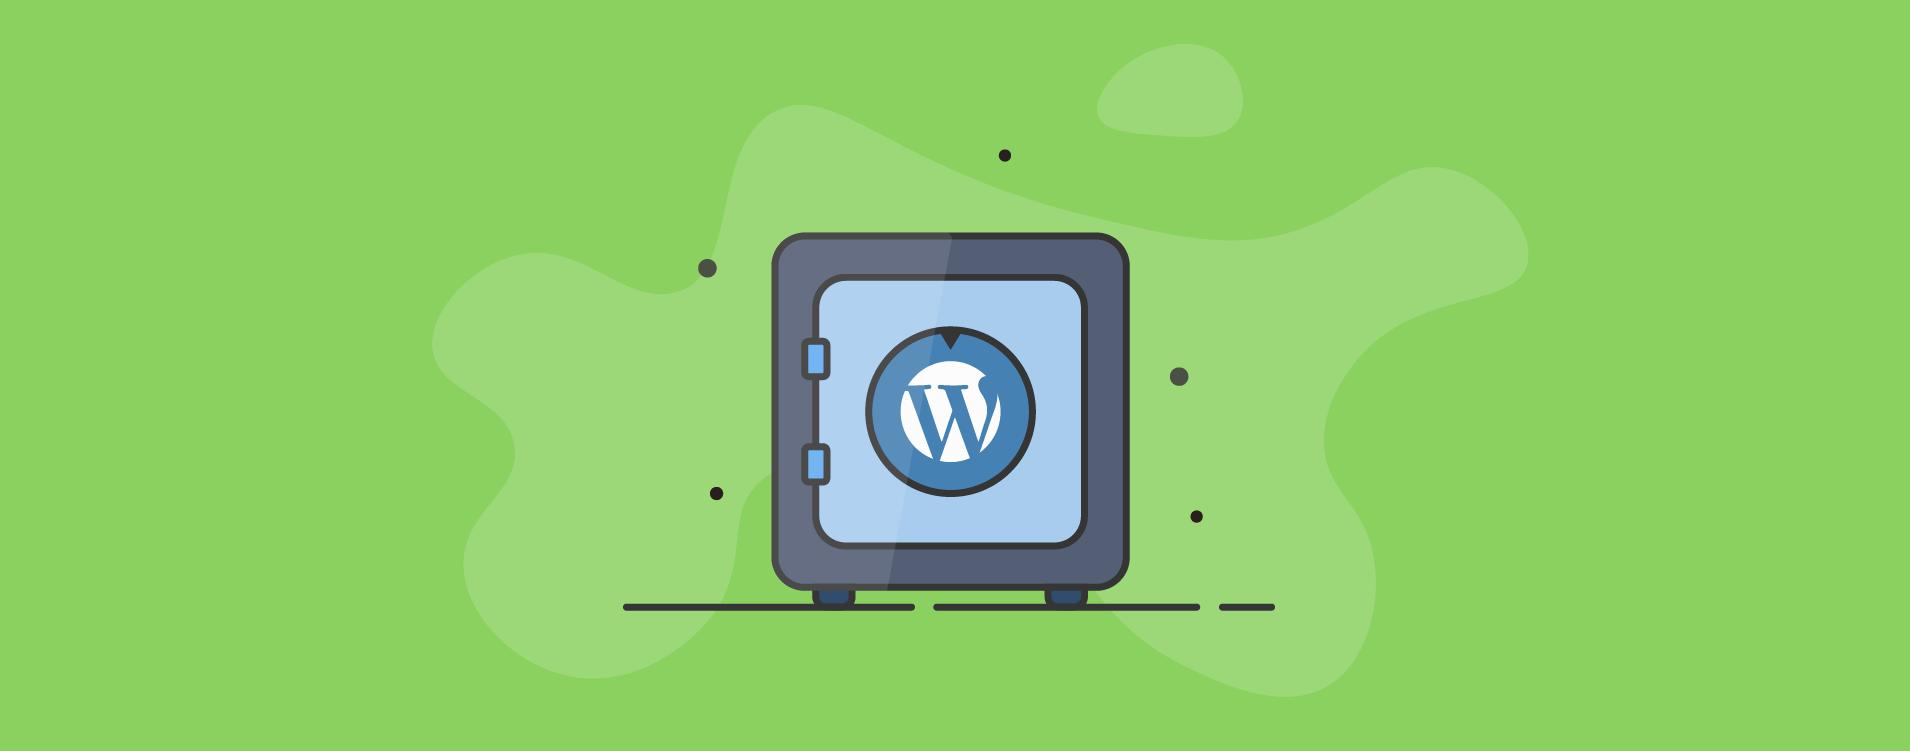 WordPress Infection